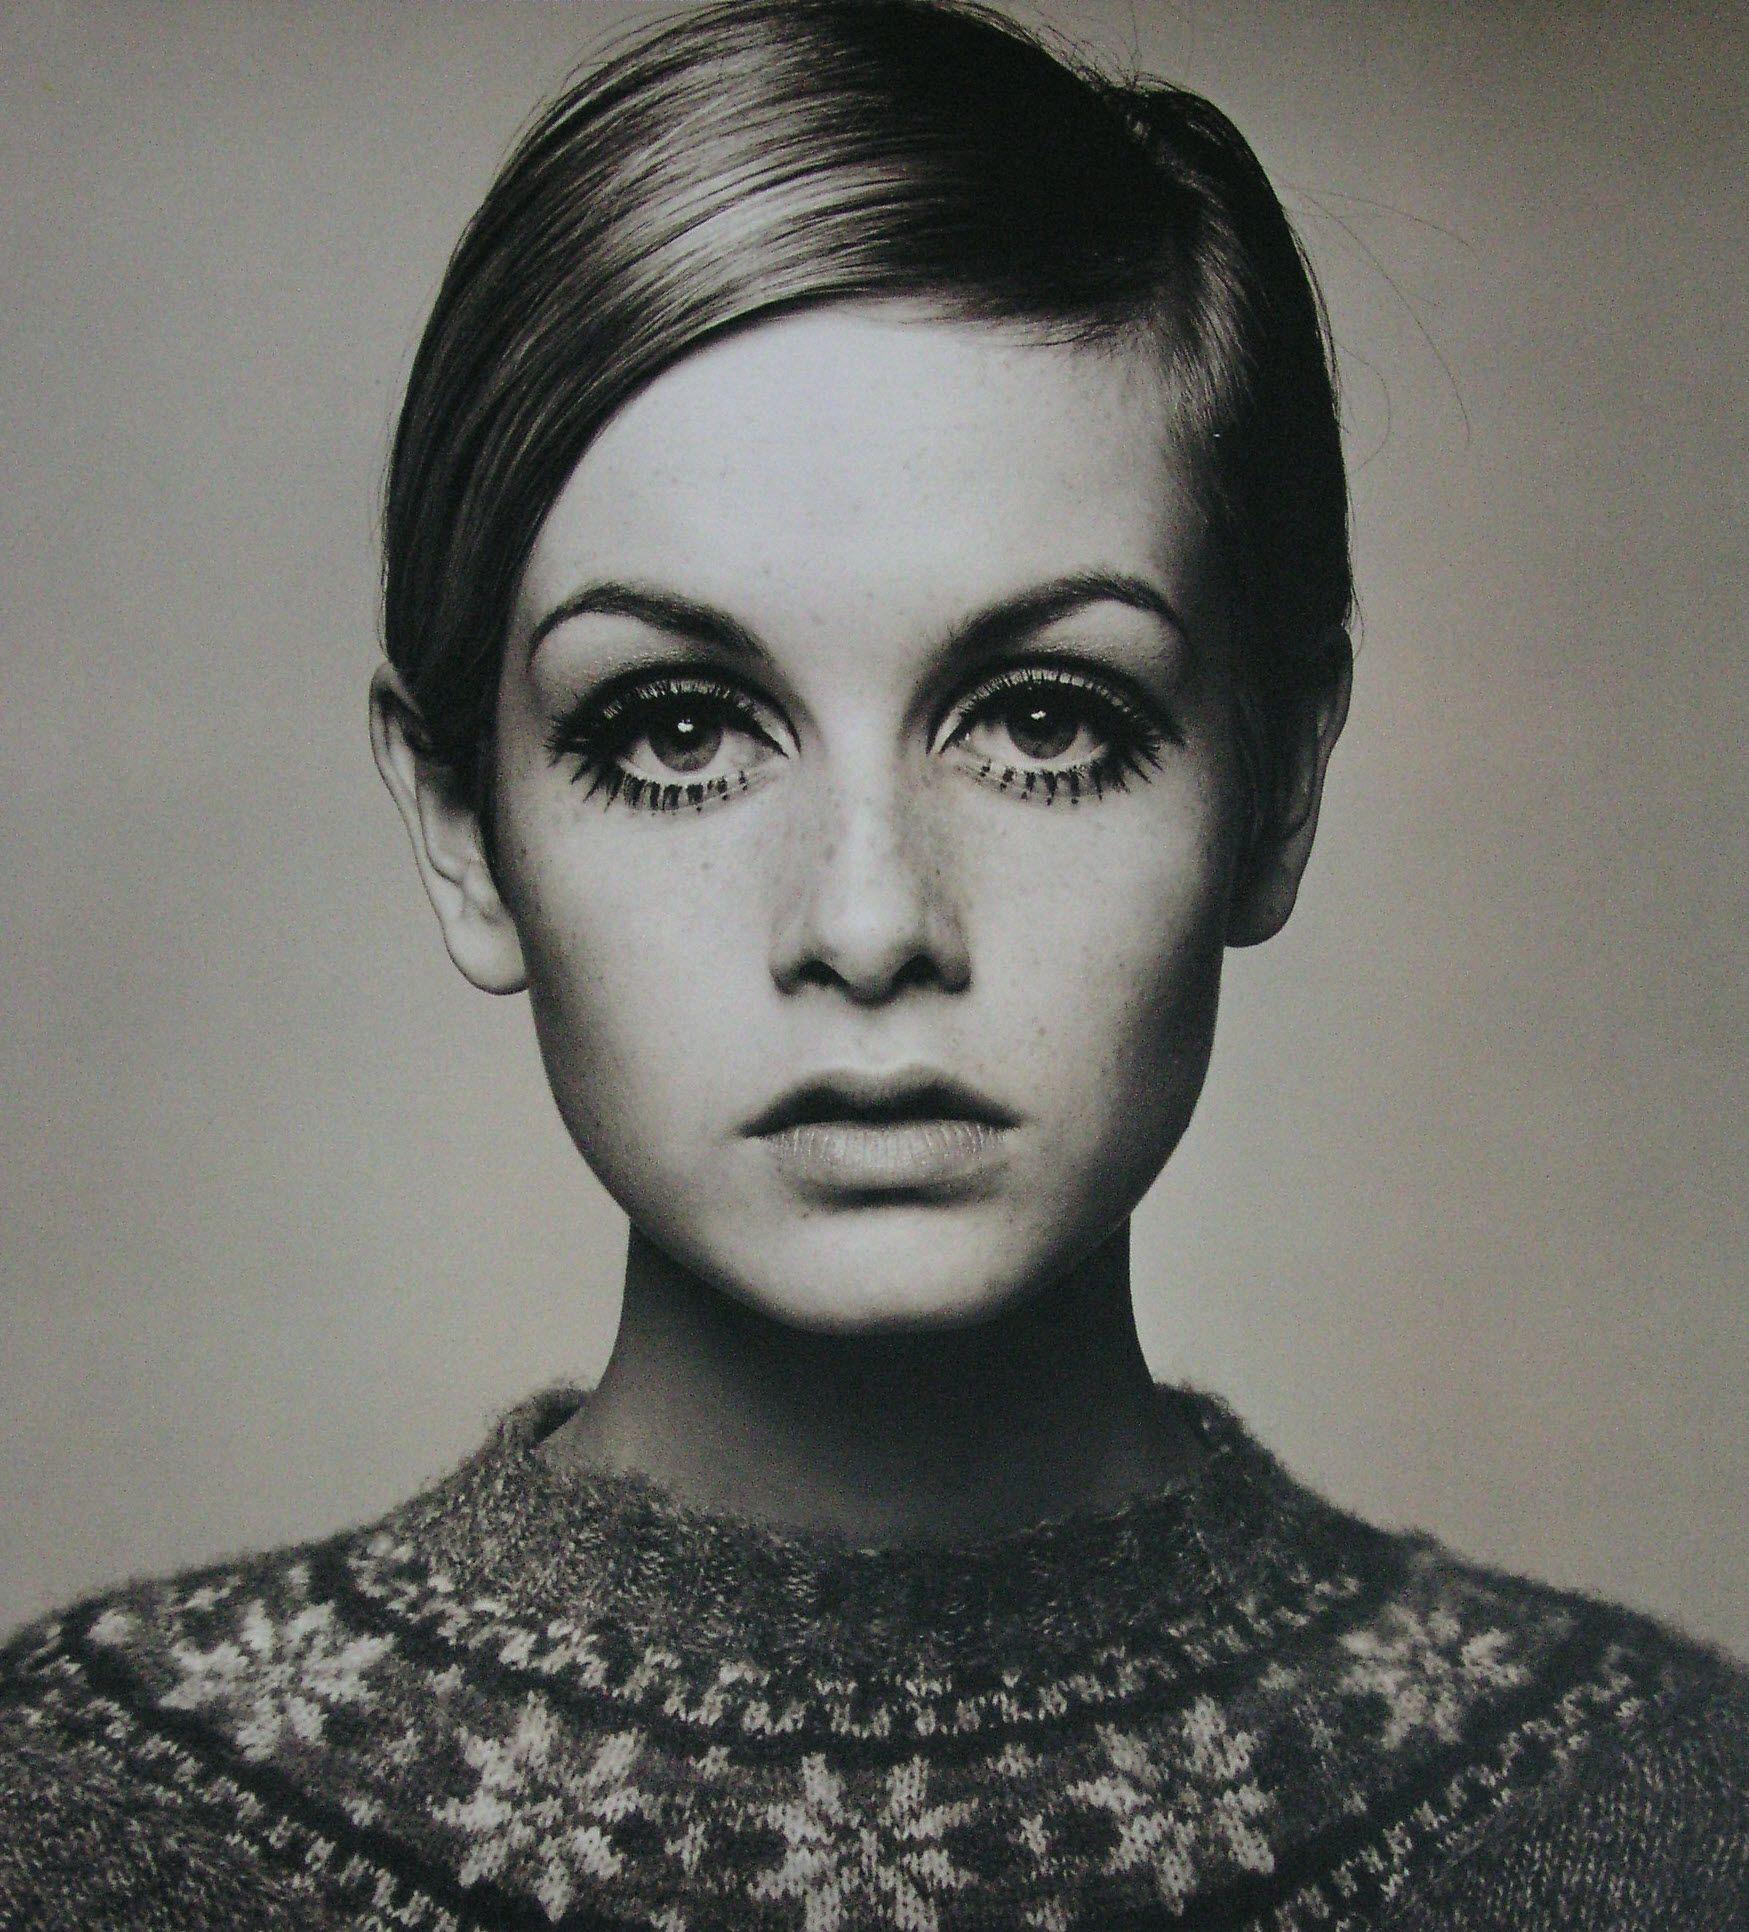 Portrait of model Twiggy by Barry Lategan 1966